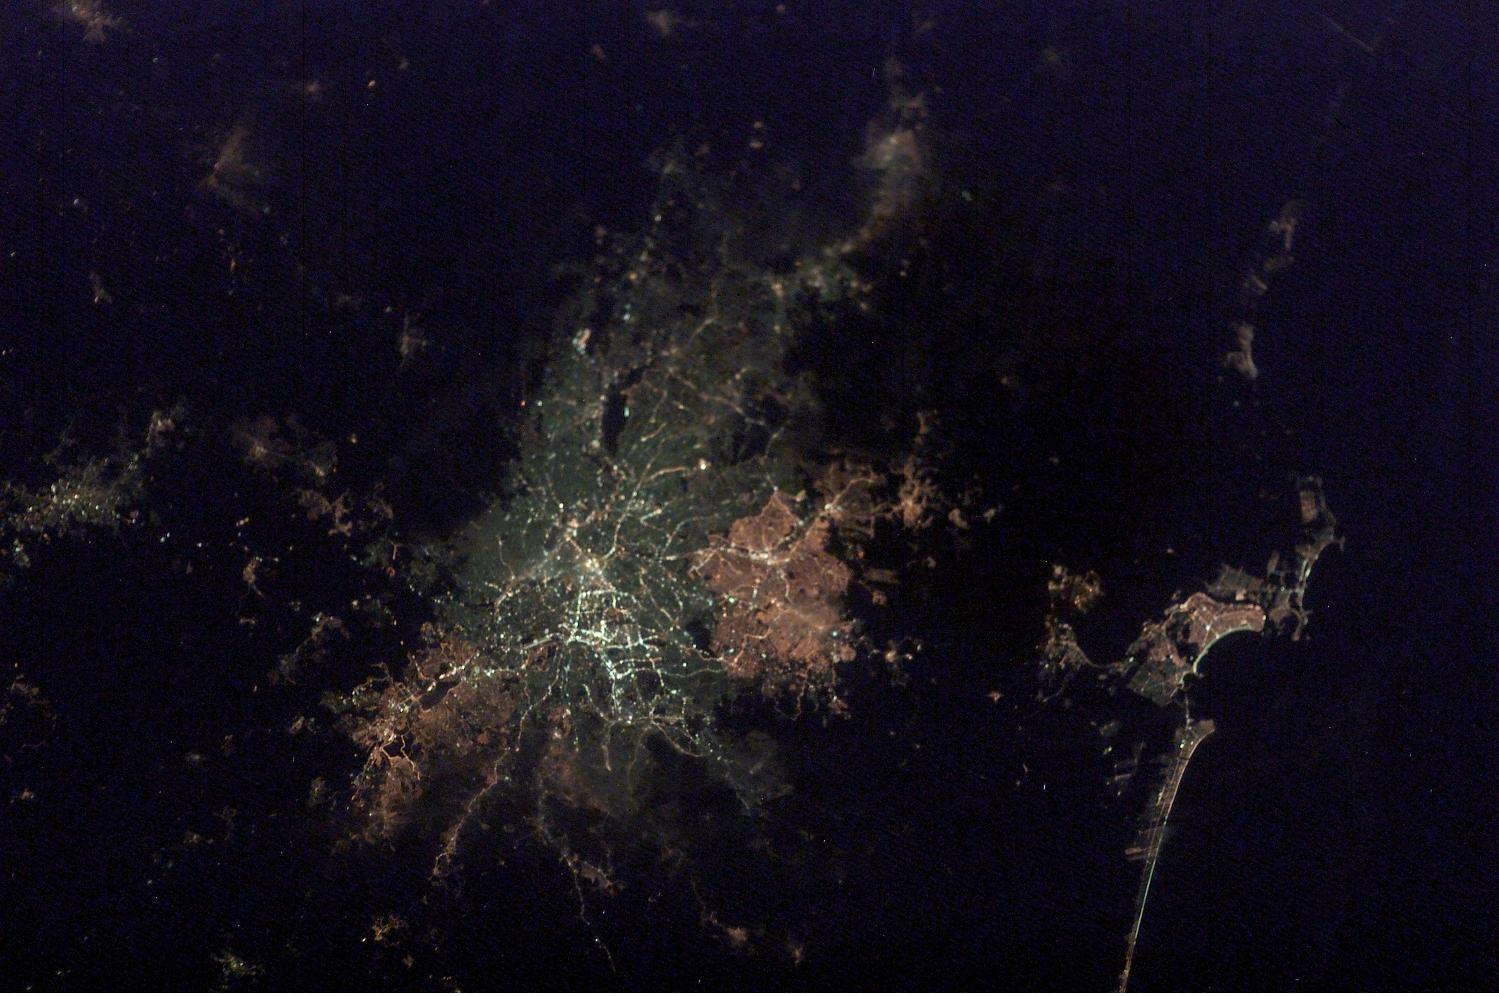 Imagen, Foto Satelite de la Ciudad de São Paulo de Noche, Brasil